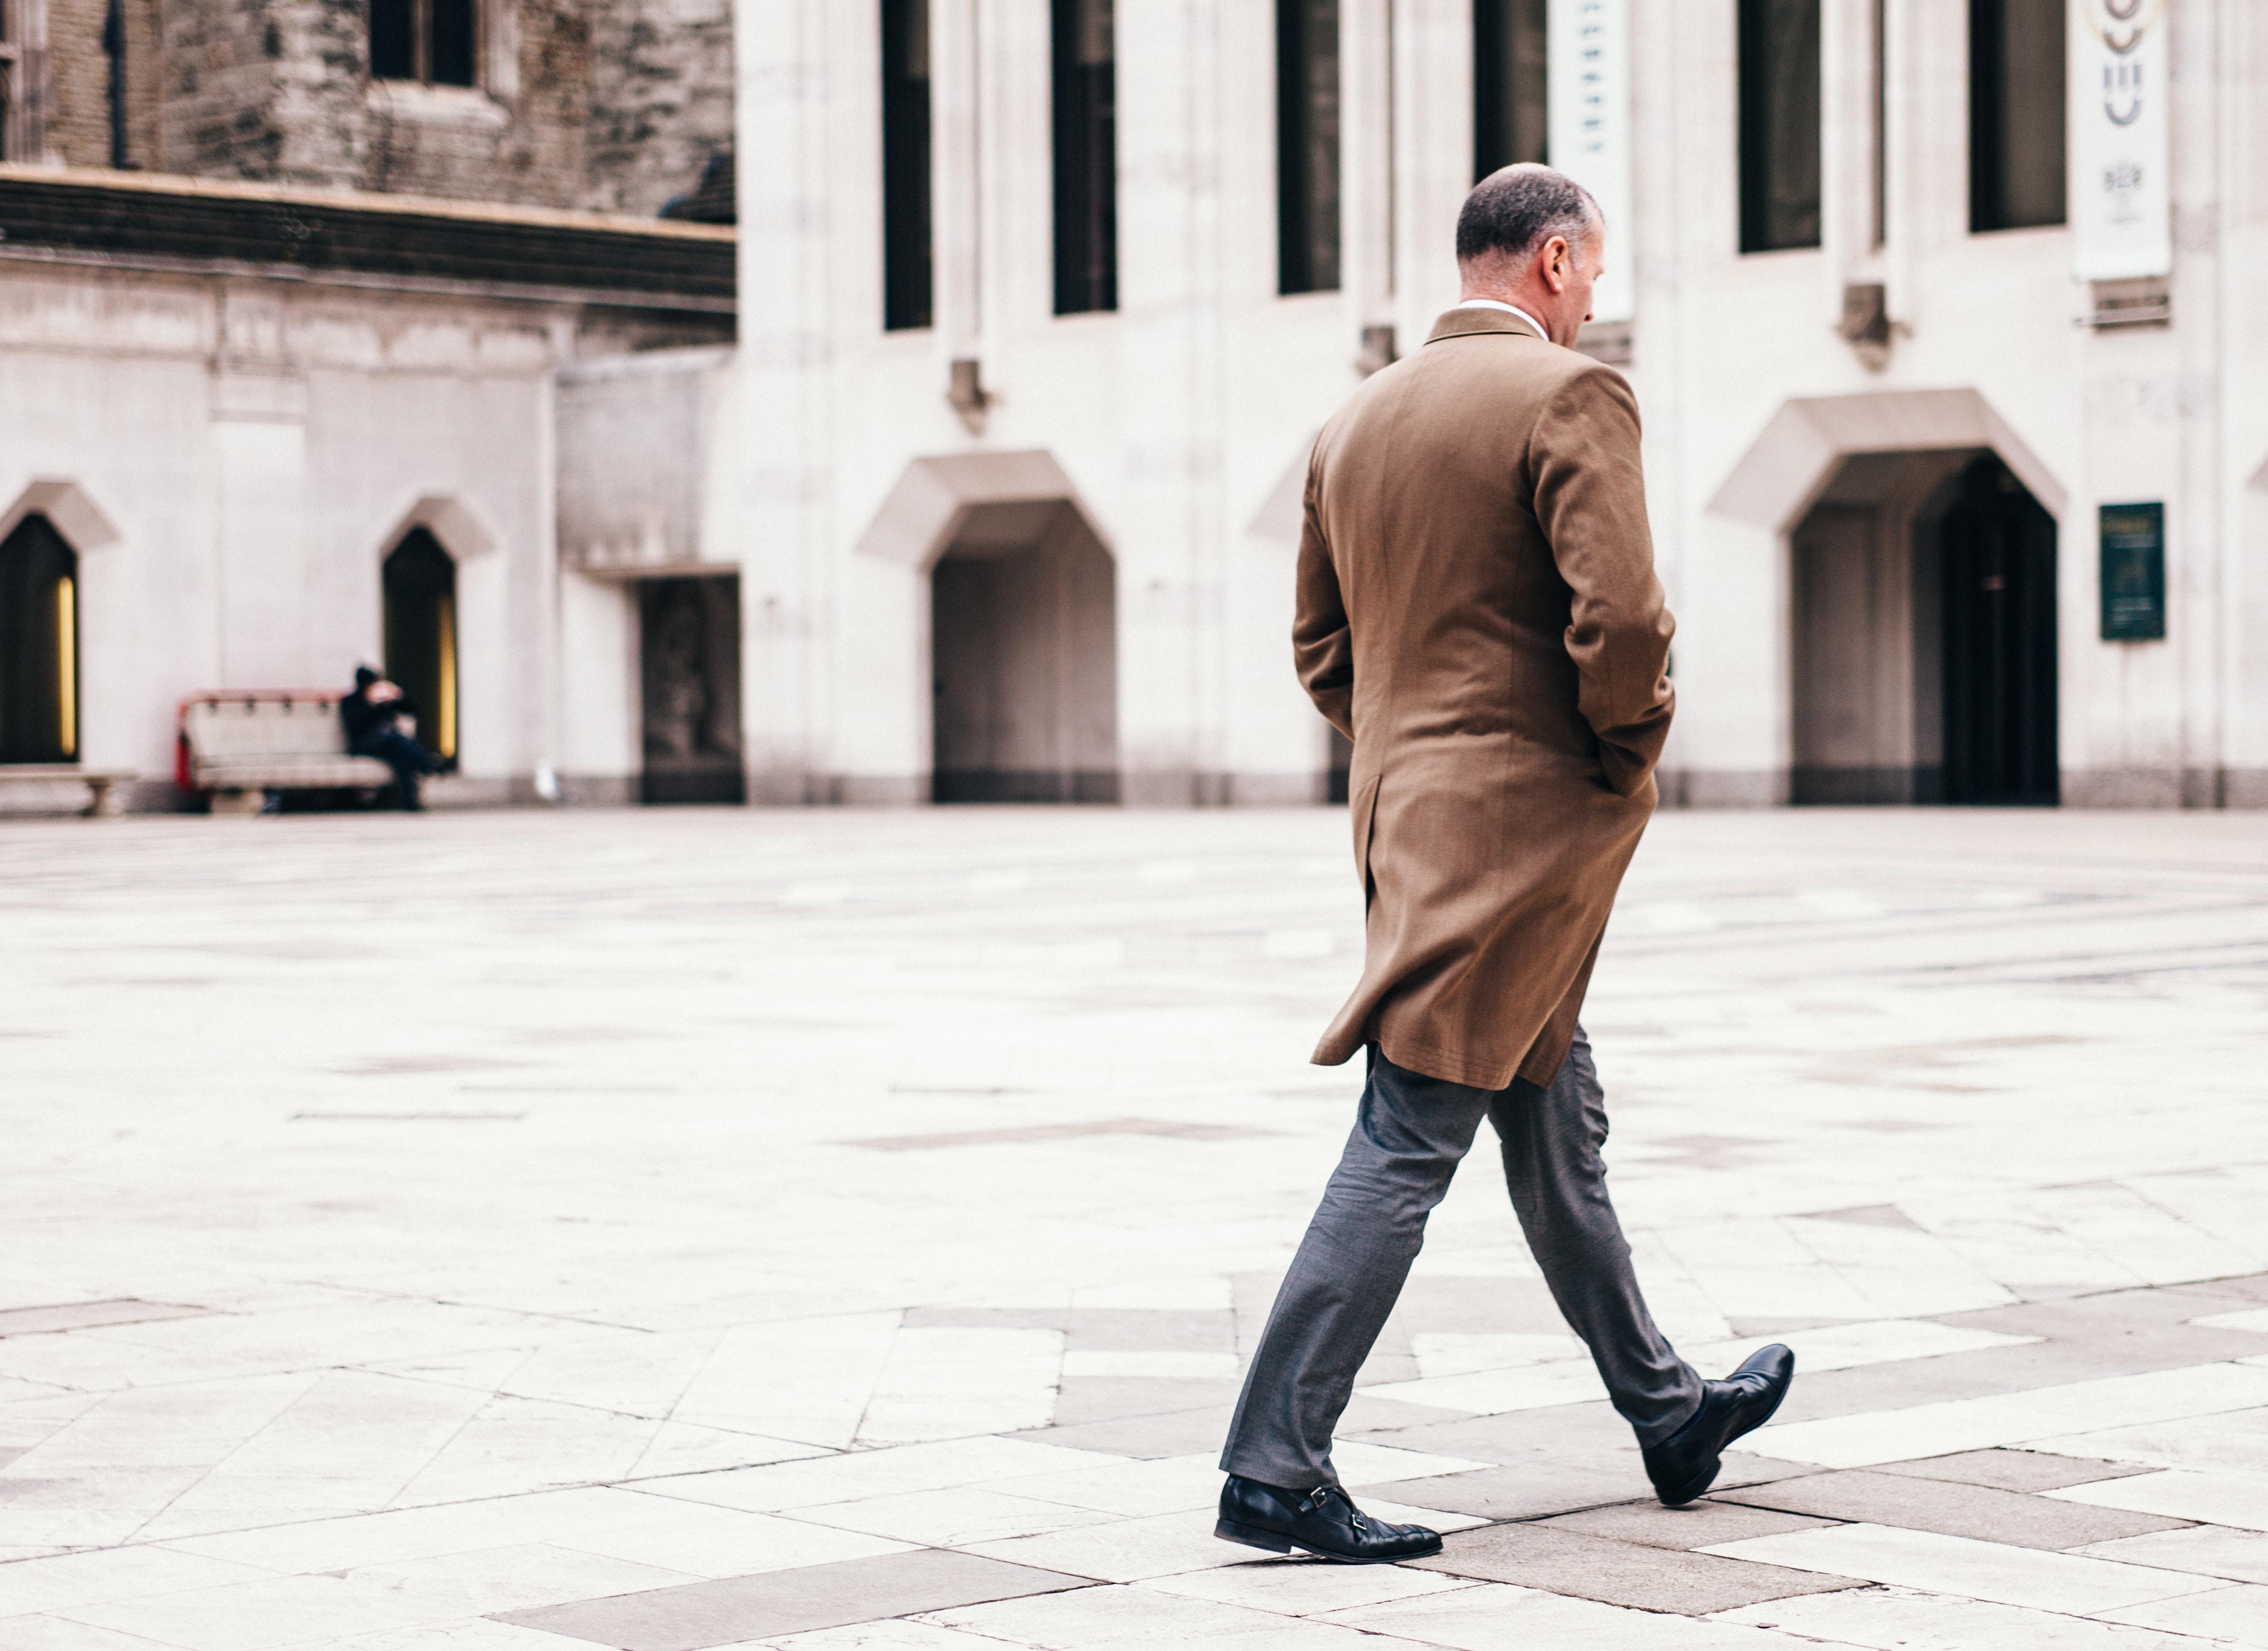 A man in a brown coat walking across an urban plaza